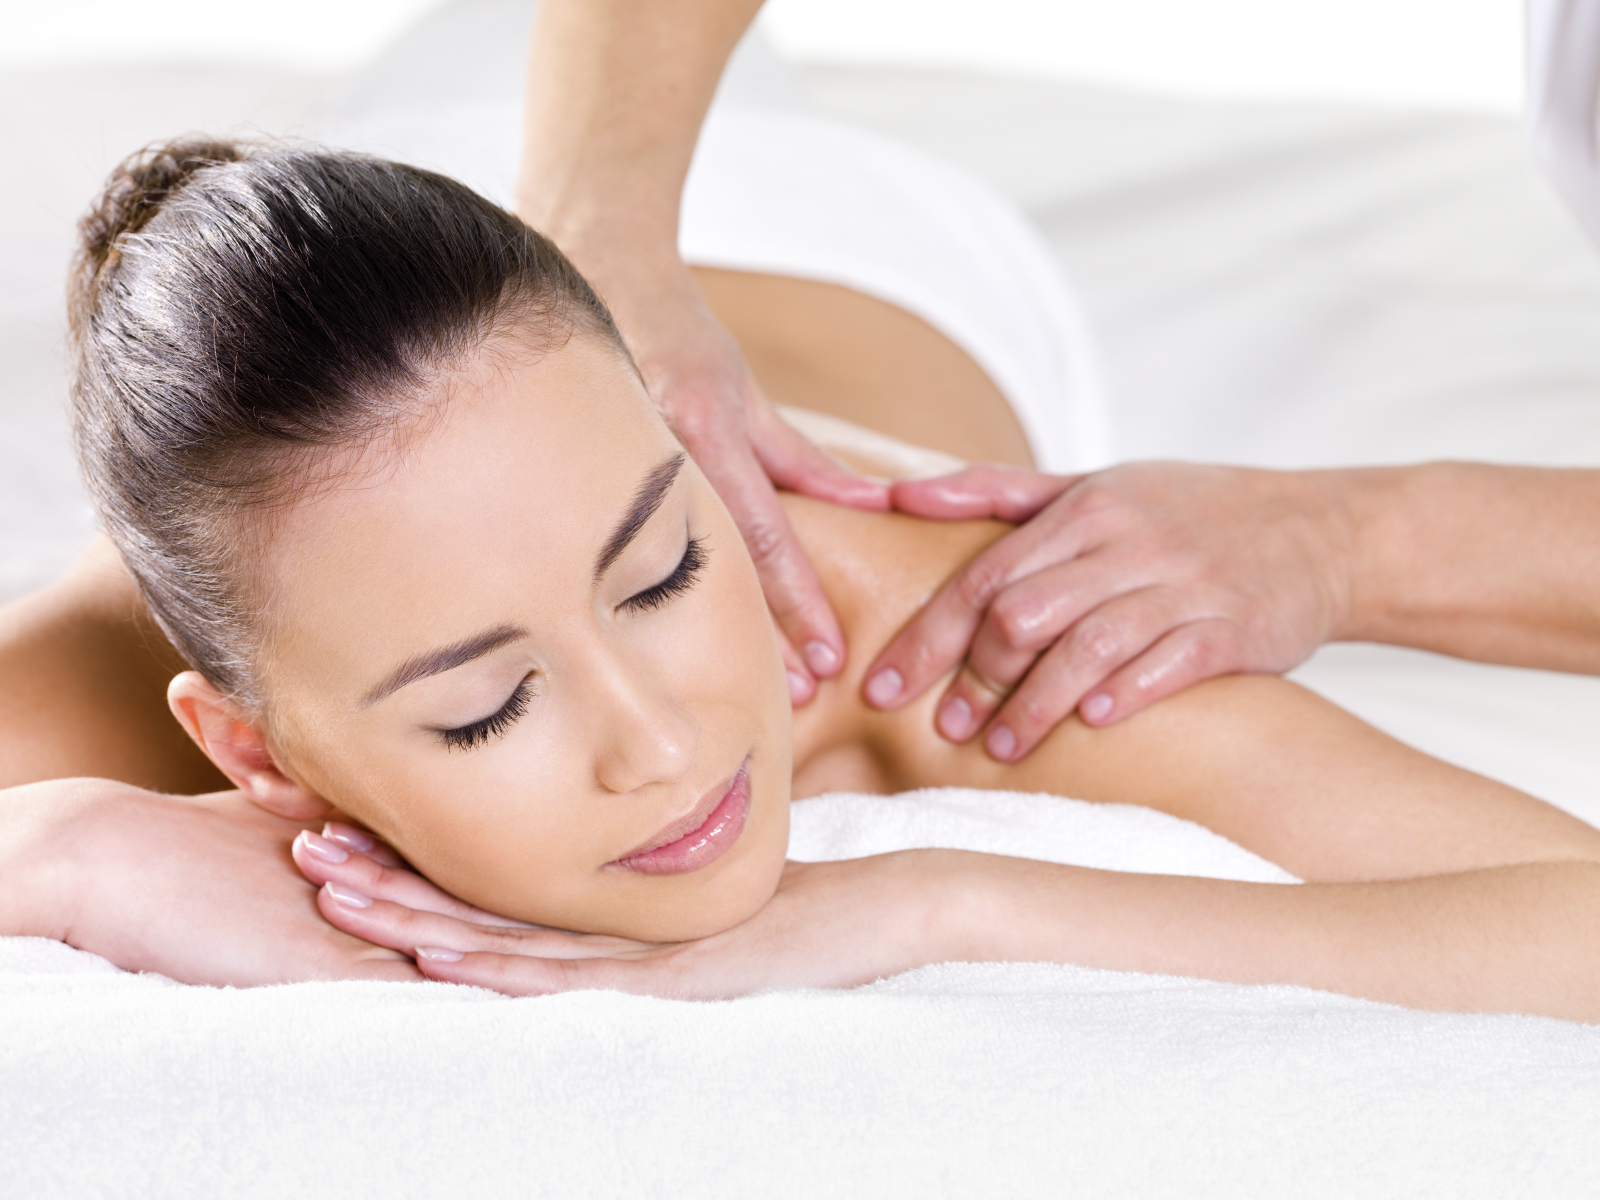 Woman having massage. Stock image. Credit Veritas med center.